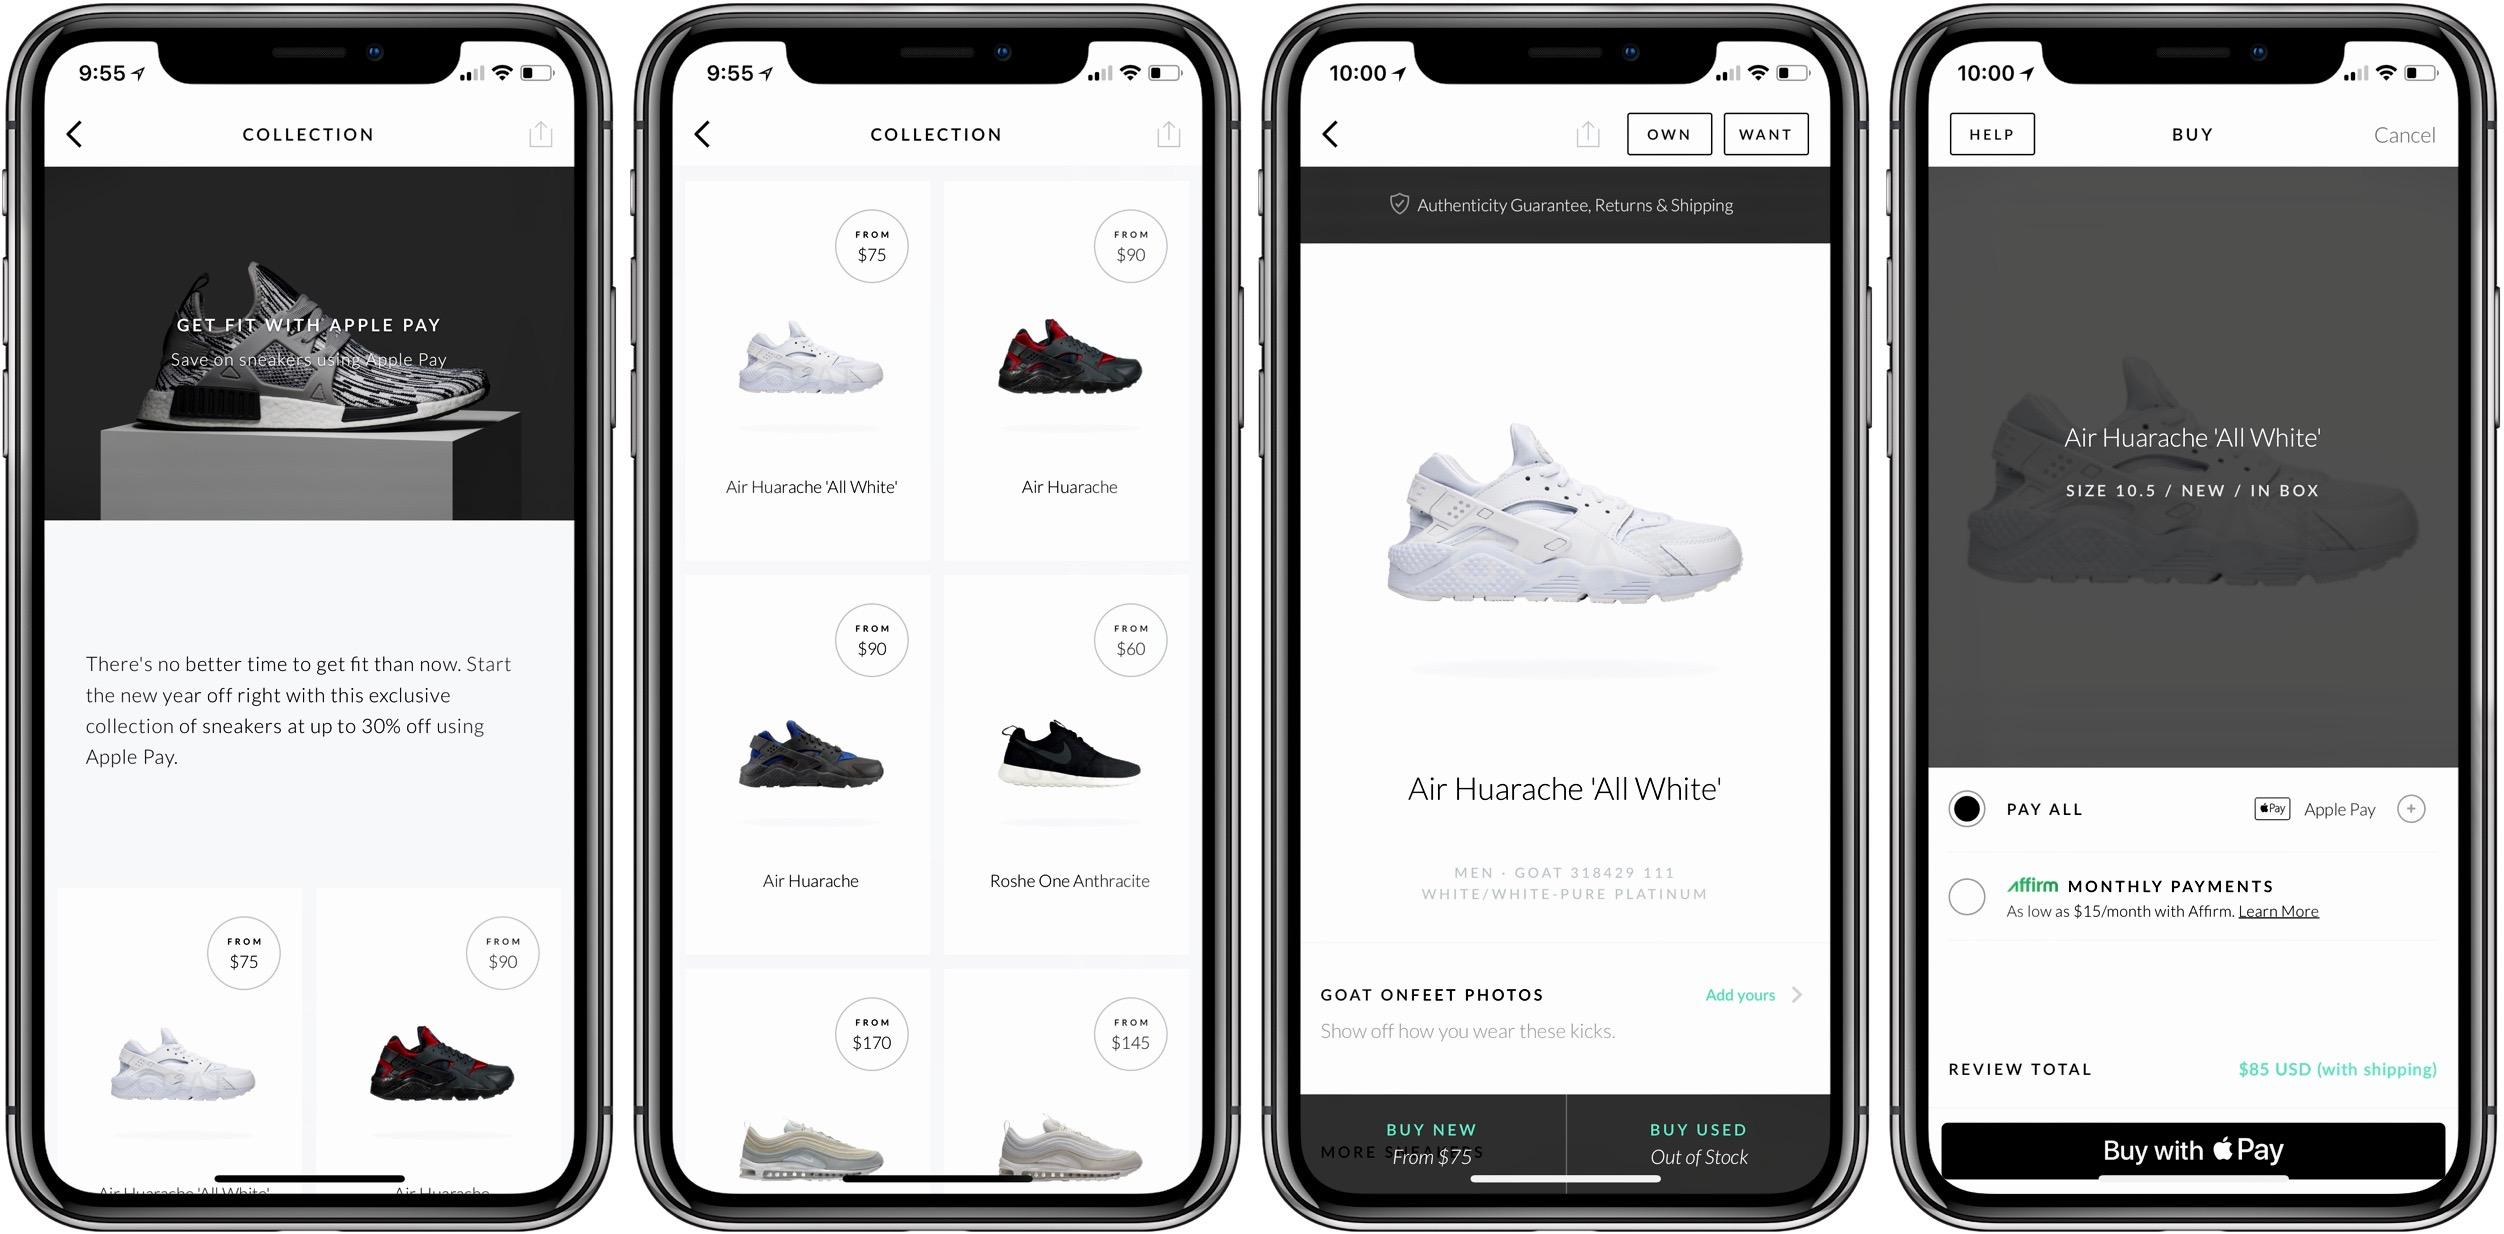 off sneakers through GOAT app